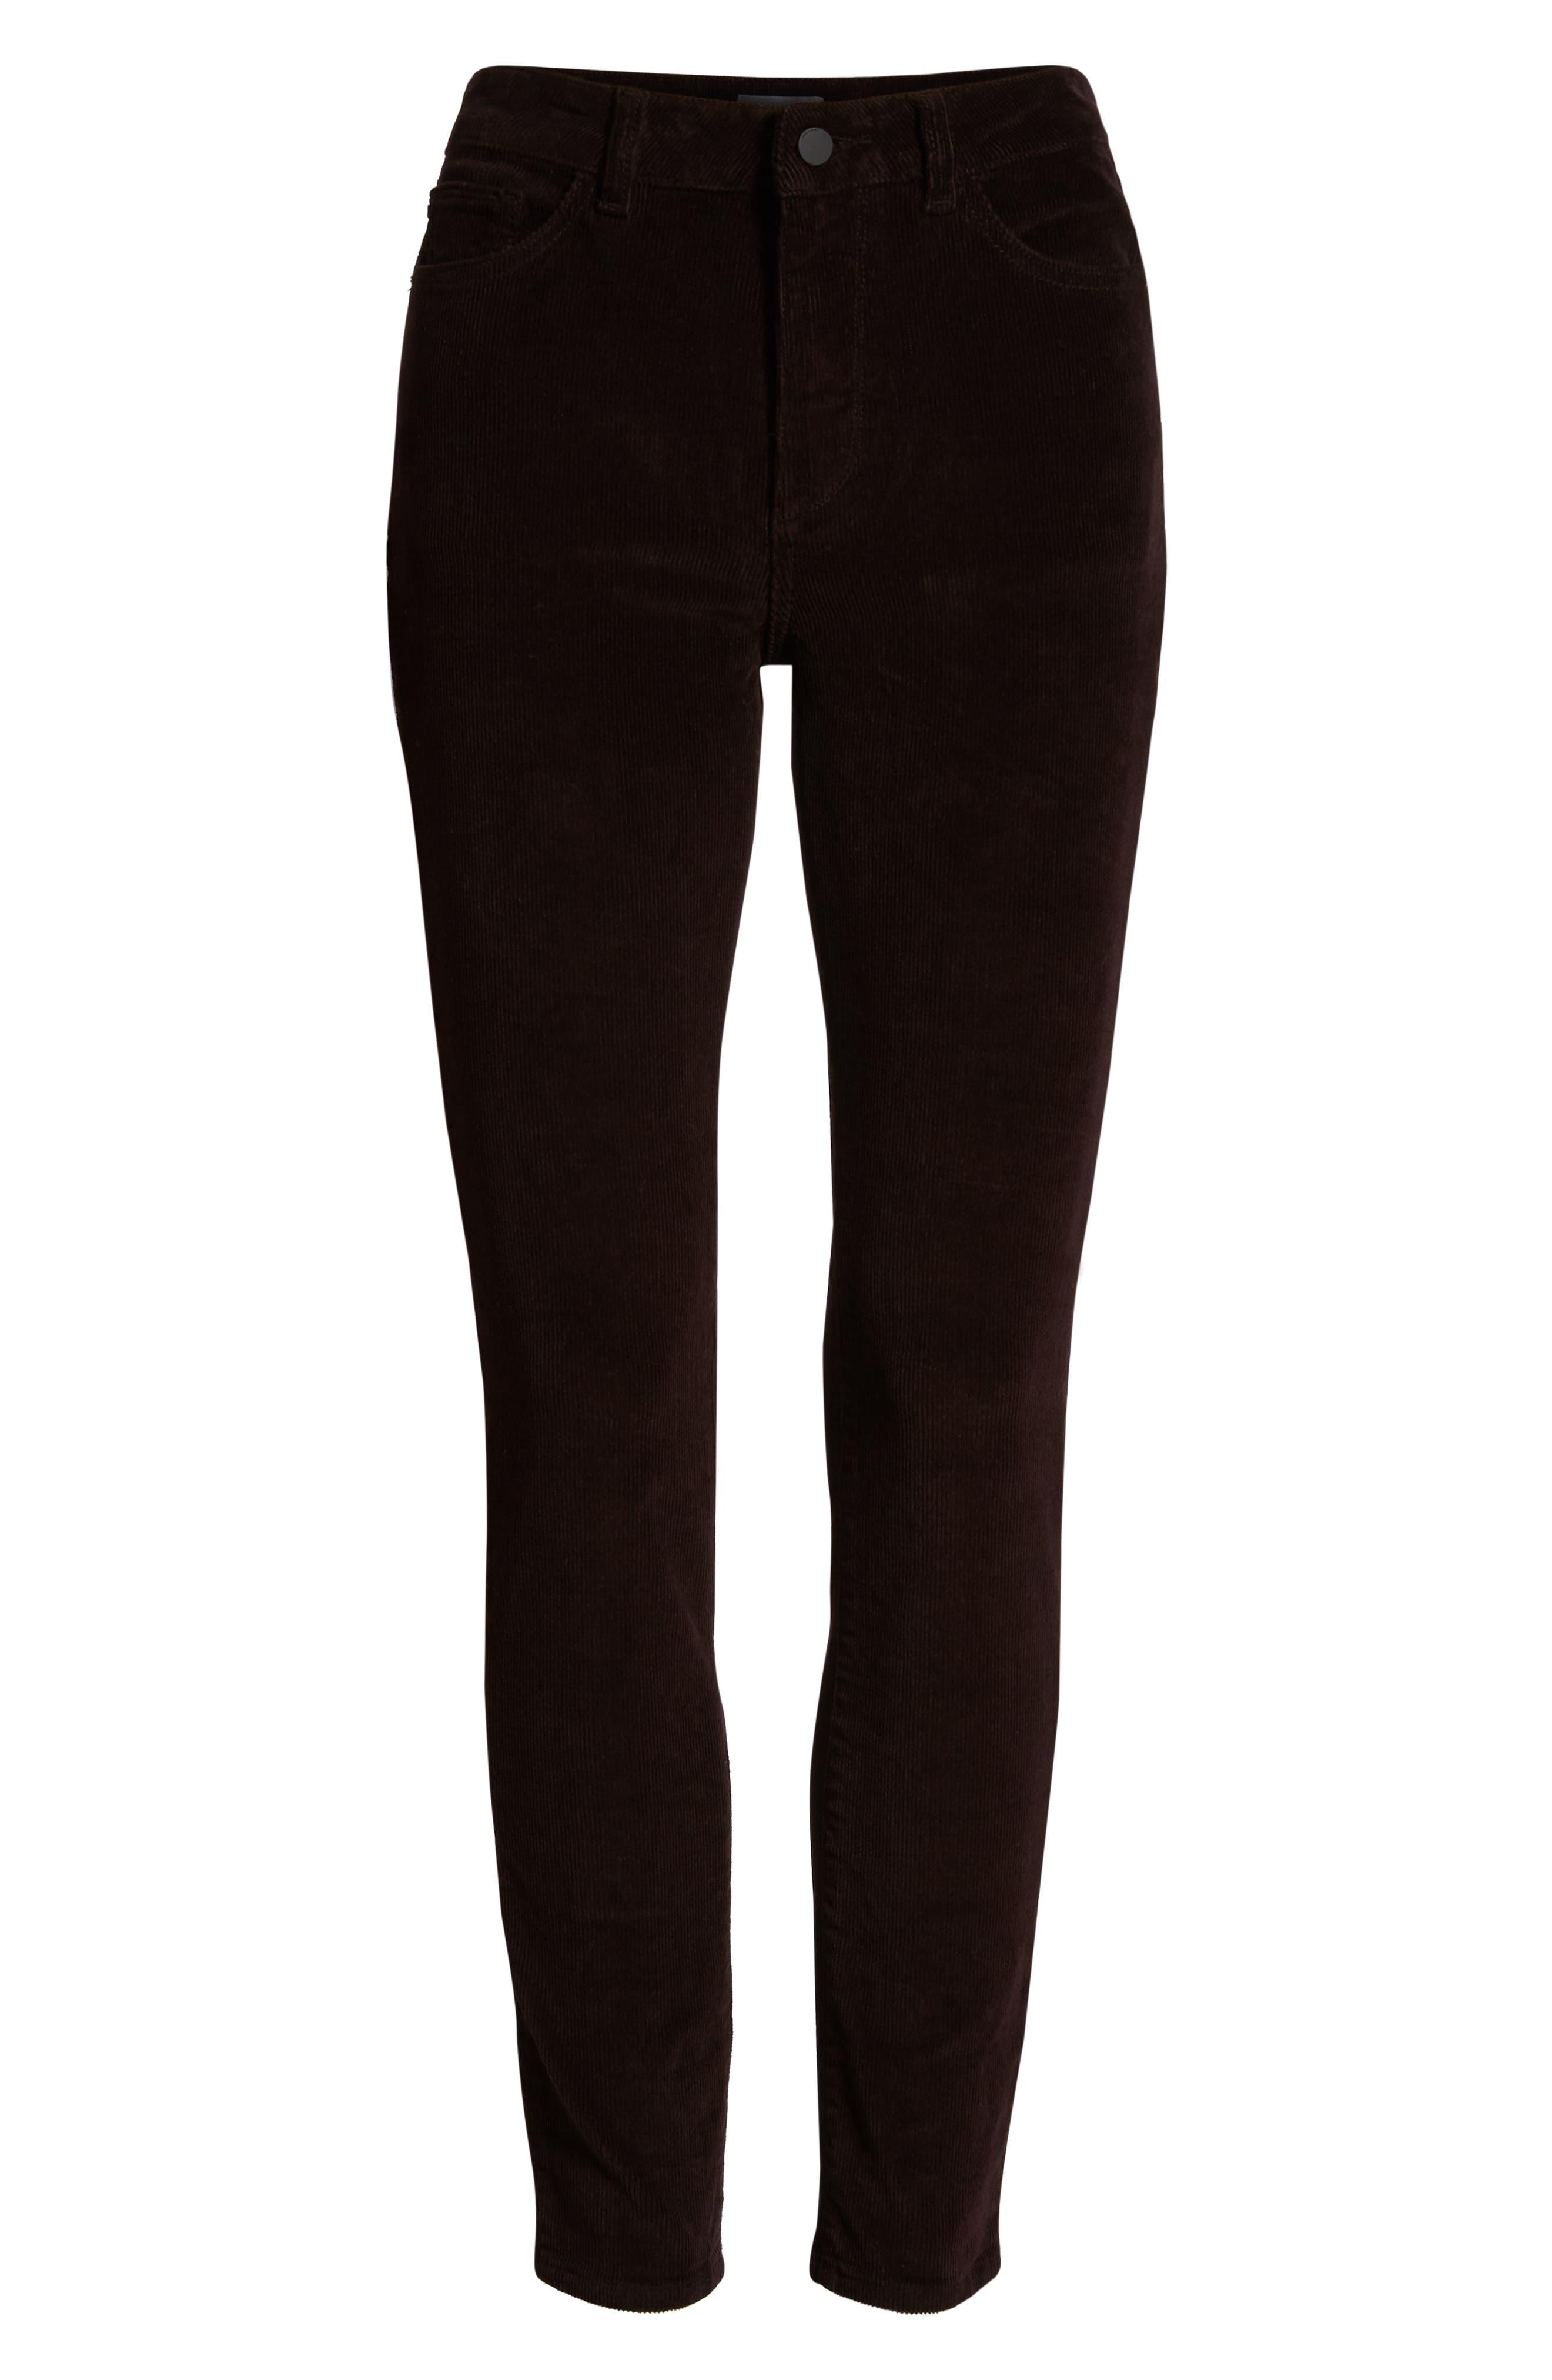 Farrow High Waist Ankle Skinny Corduroy Pants,                             Alternate thumbnail 6, color,                             BIRCH LAKE